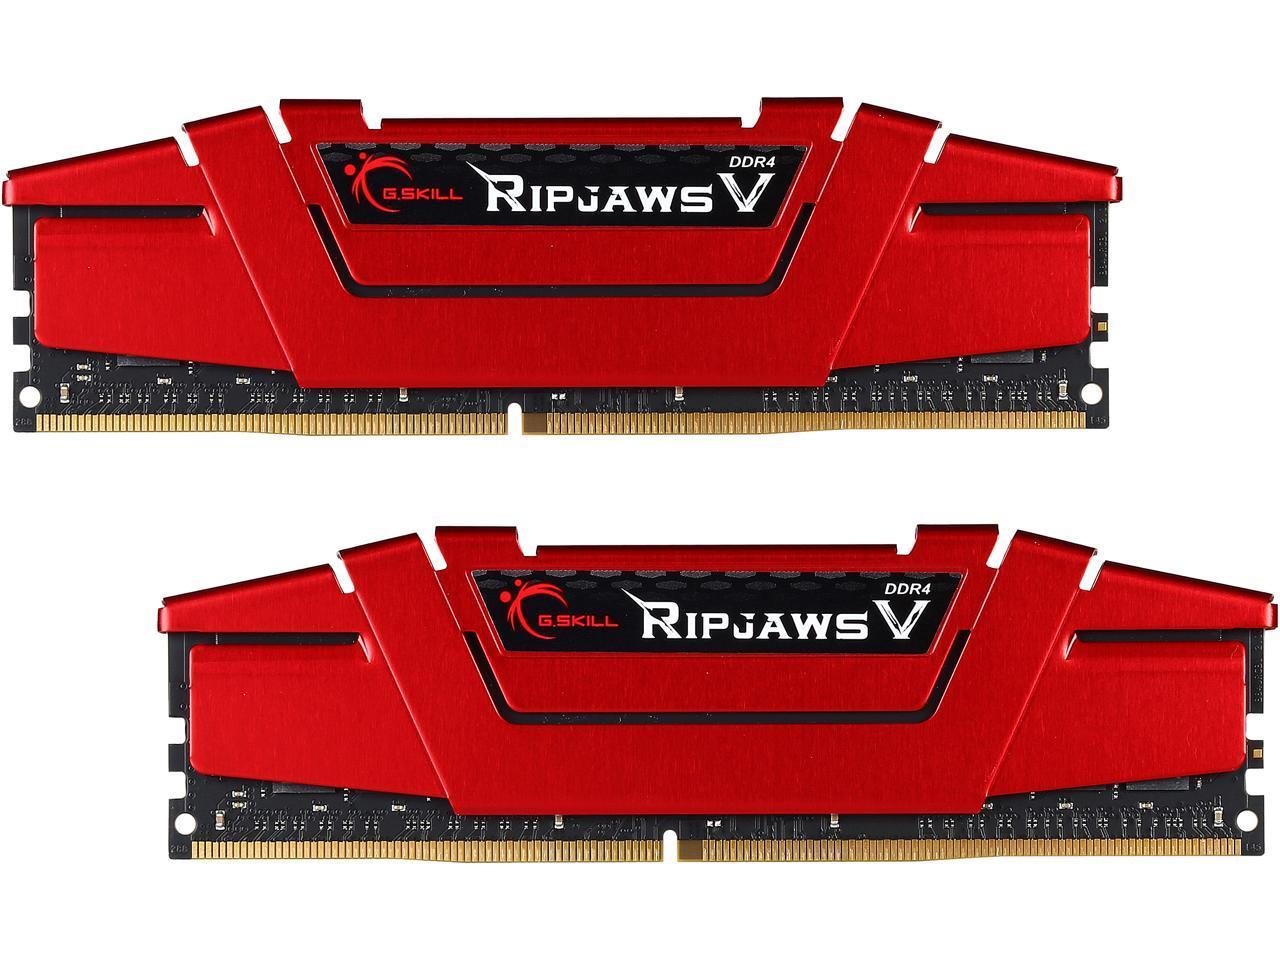 G.Skill Ripjaws V Series 32GB (2x16GB) DDR4 3200 (red) desktop memory for $129.99 + free shipping